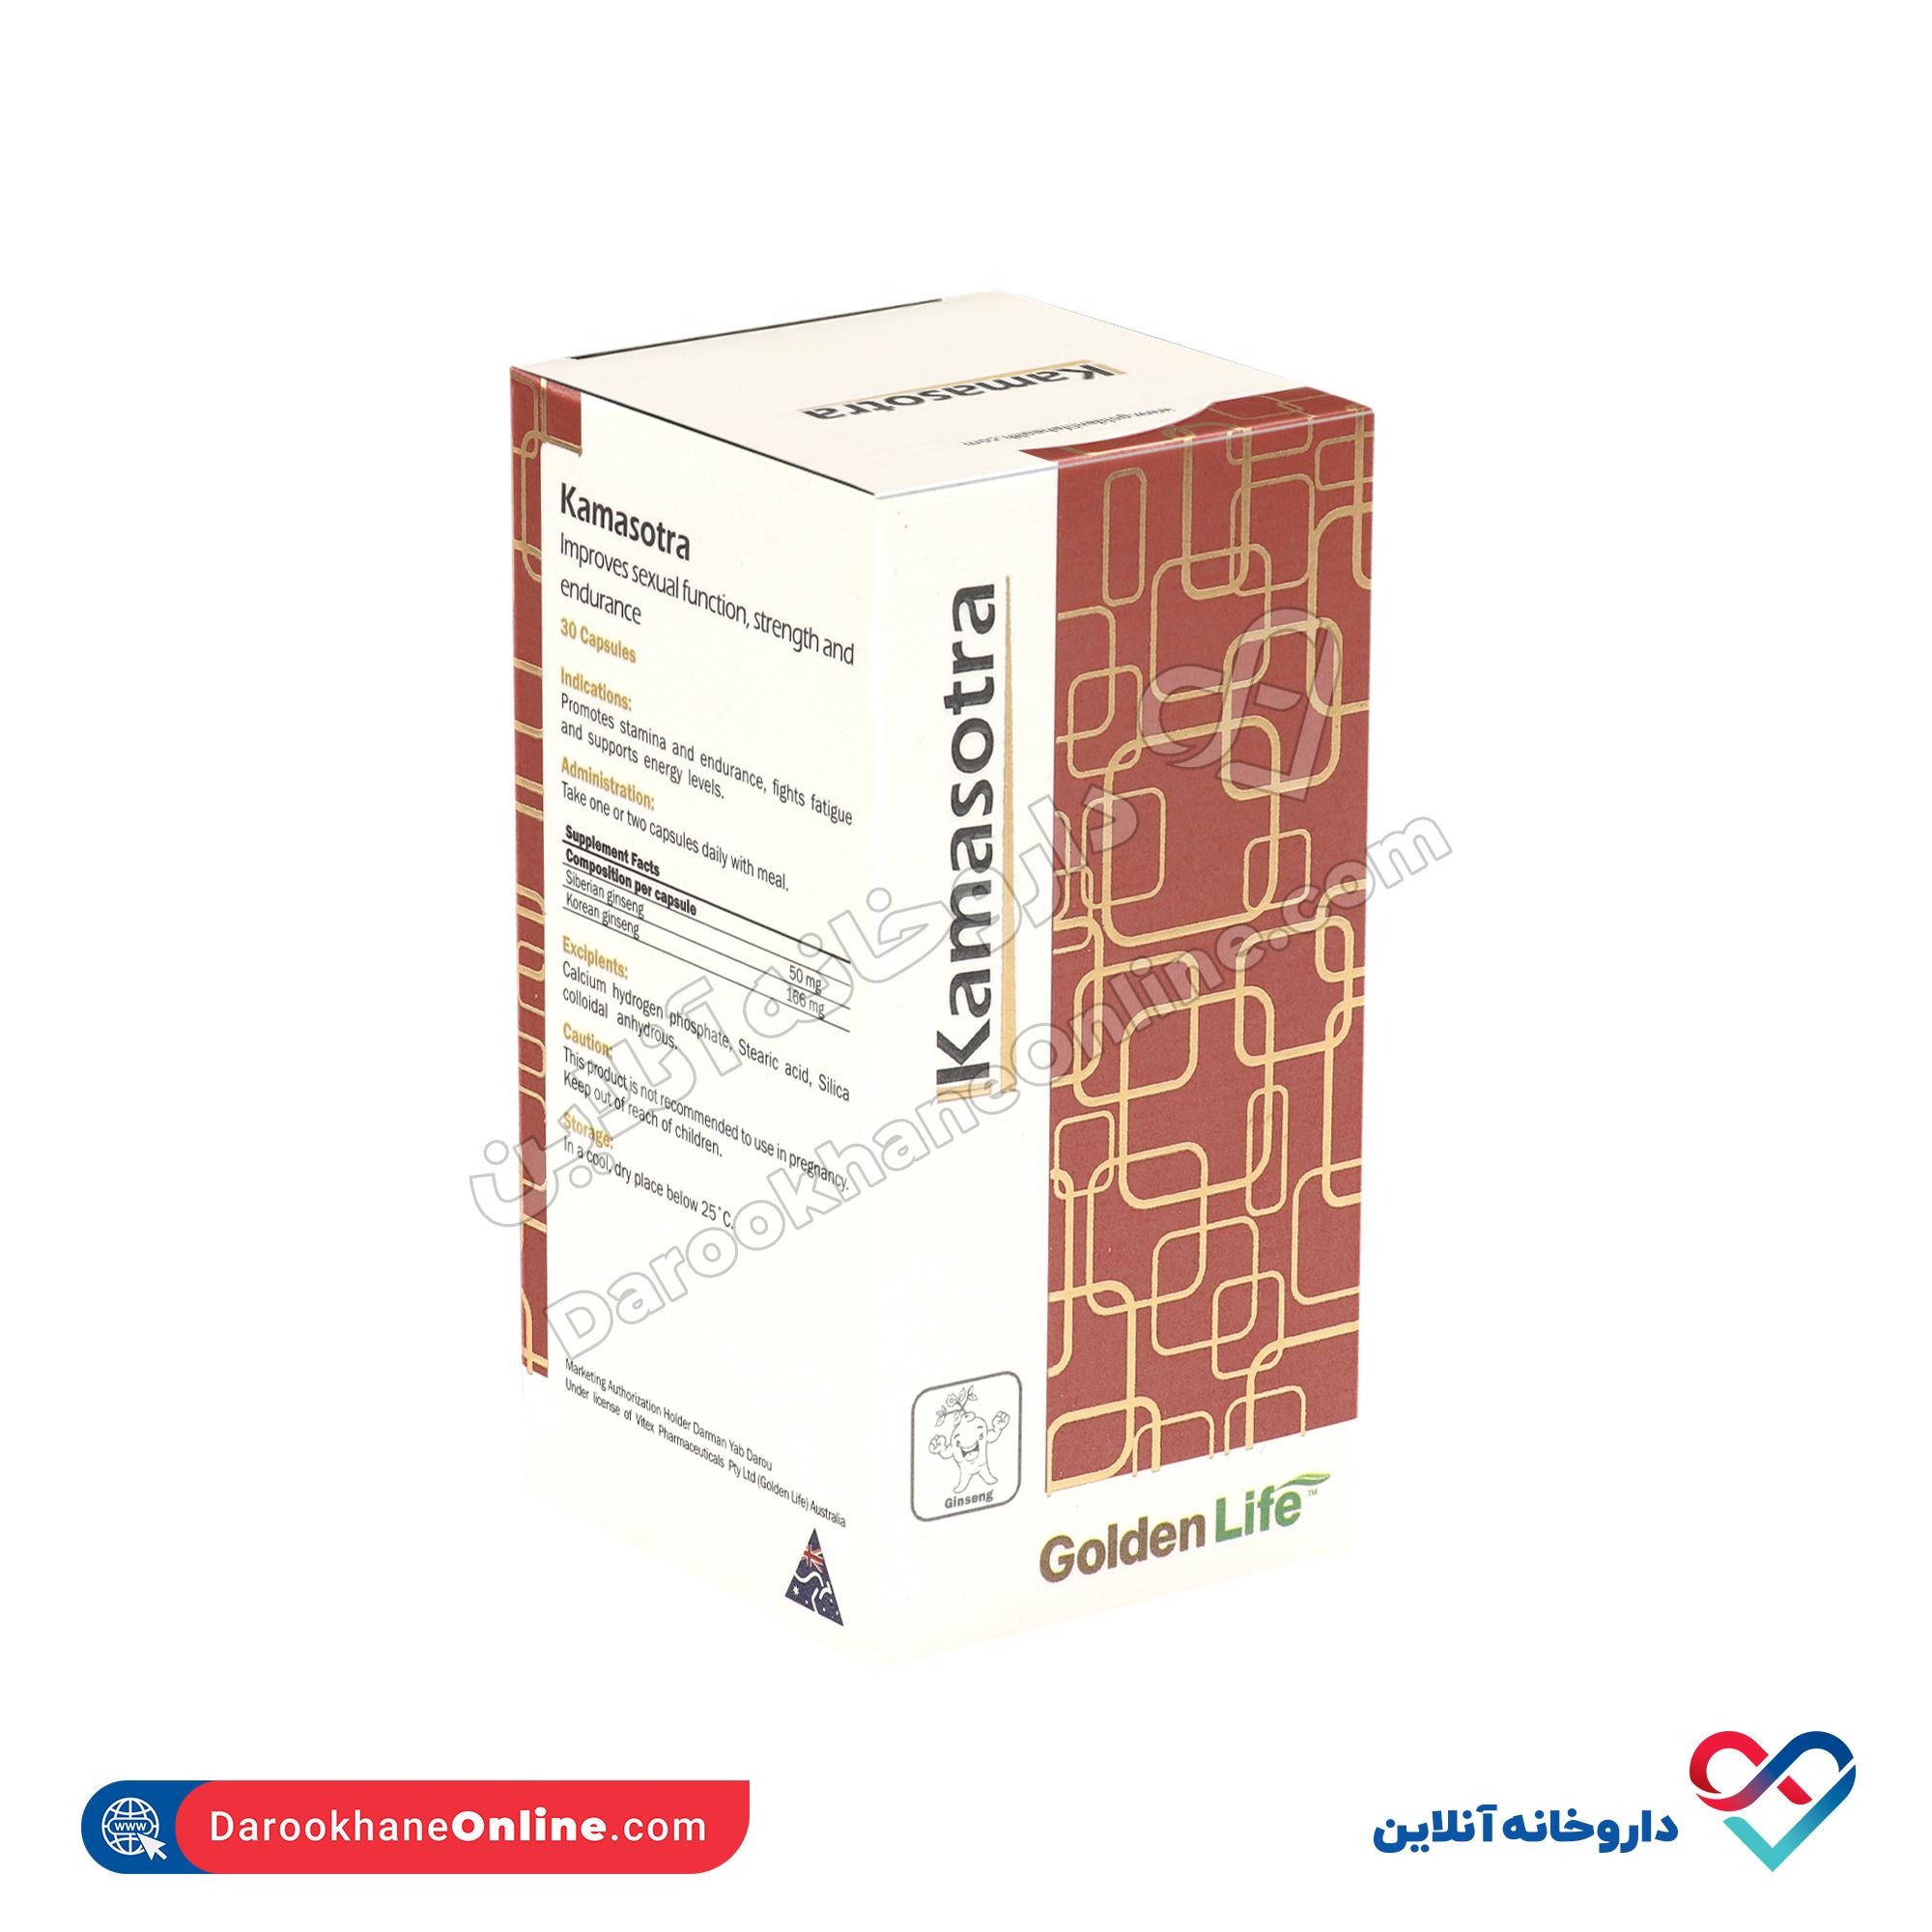 کپسول کاماسوترا گلدن لایف | 30 عدد | بهبود عملکرد جنسی،افزایش قدرت بدنی و رفع خستگی